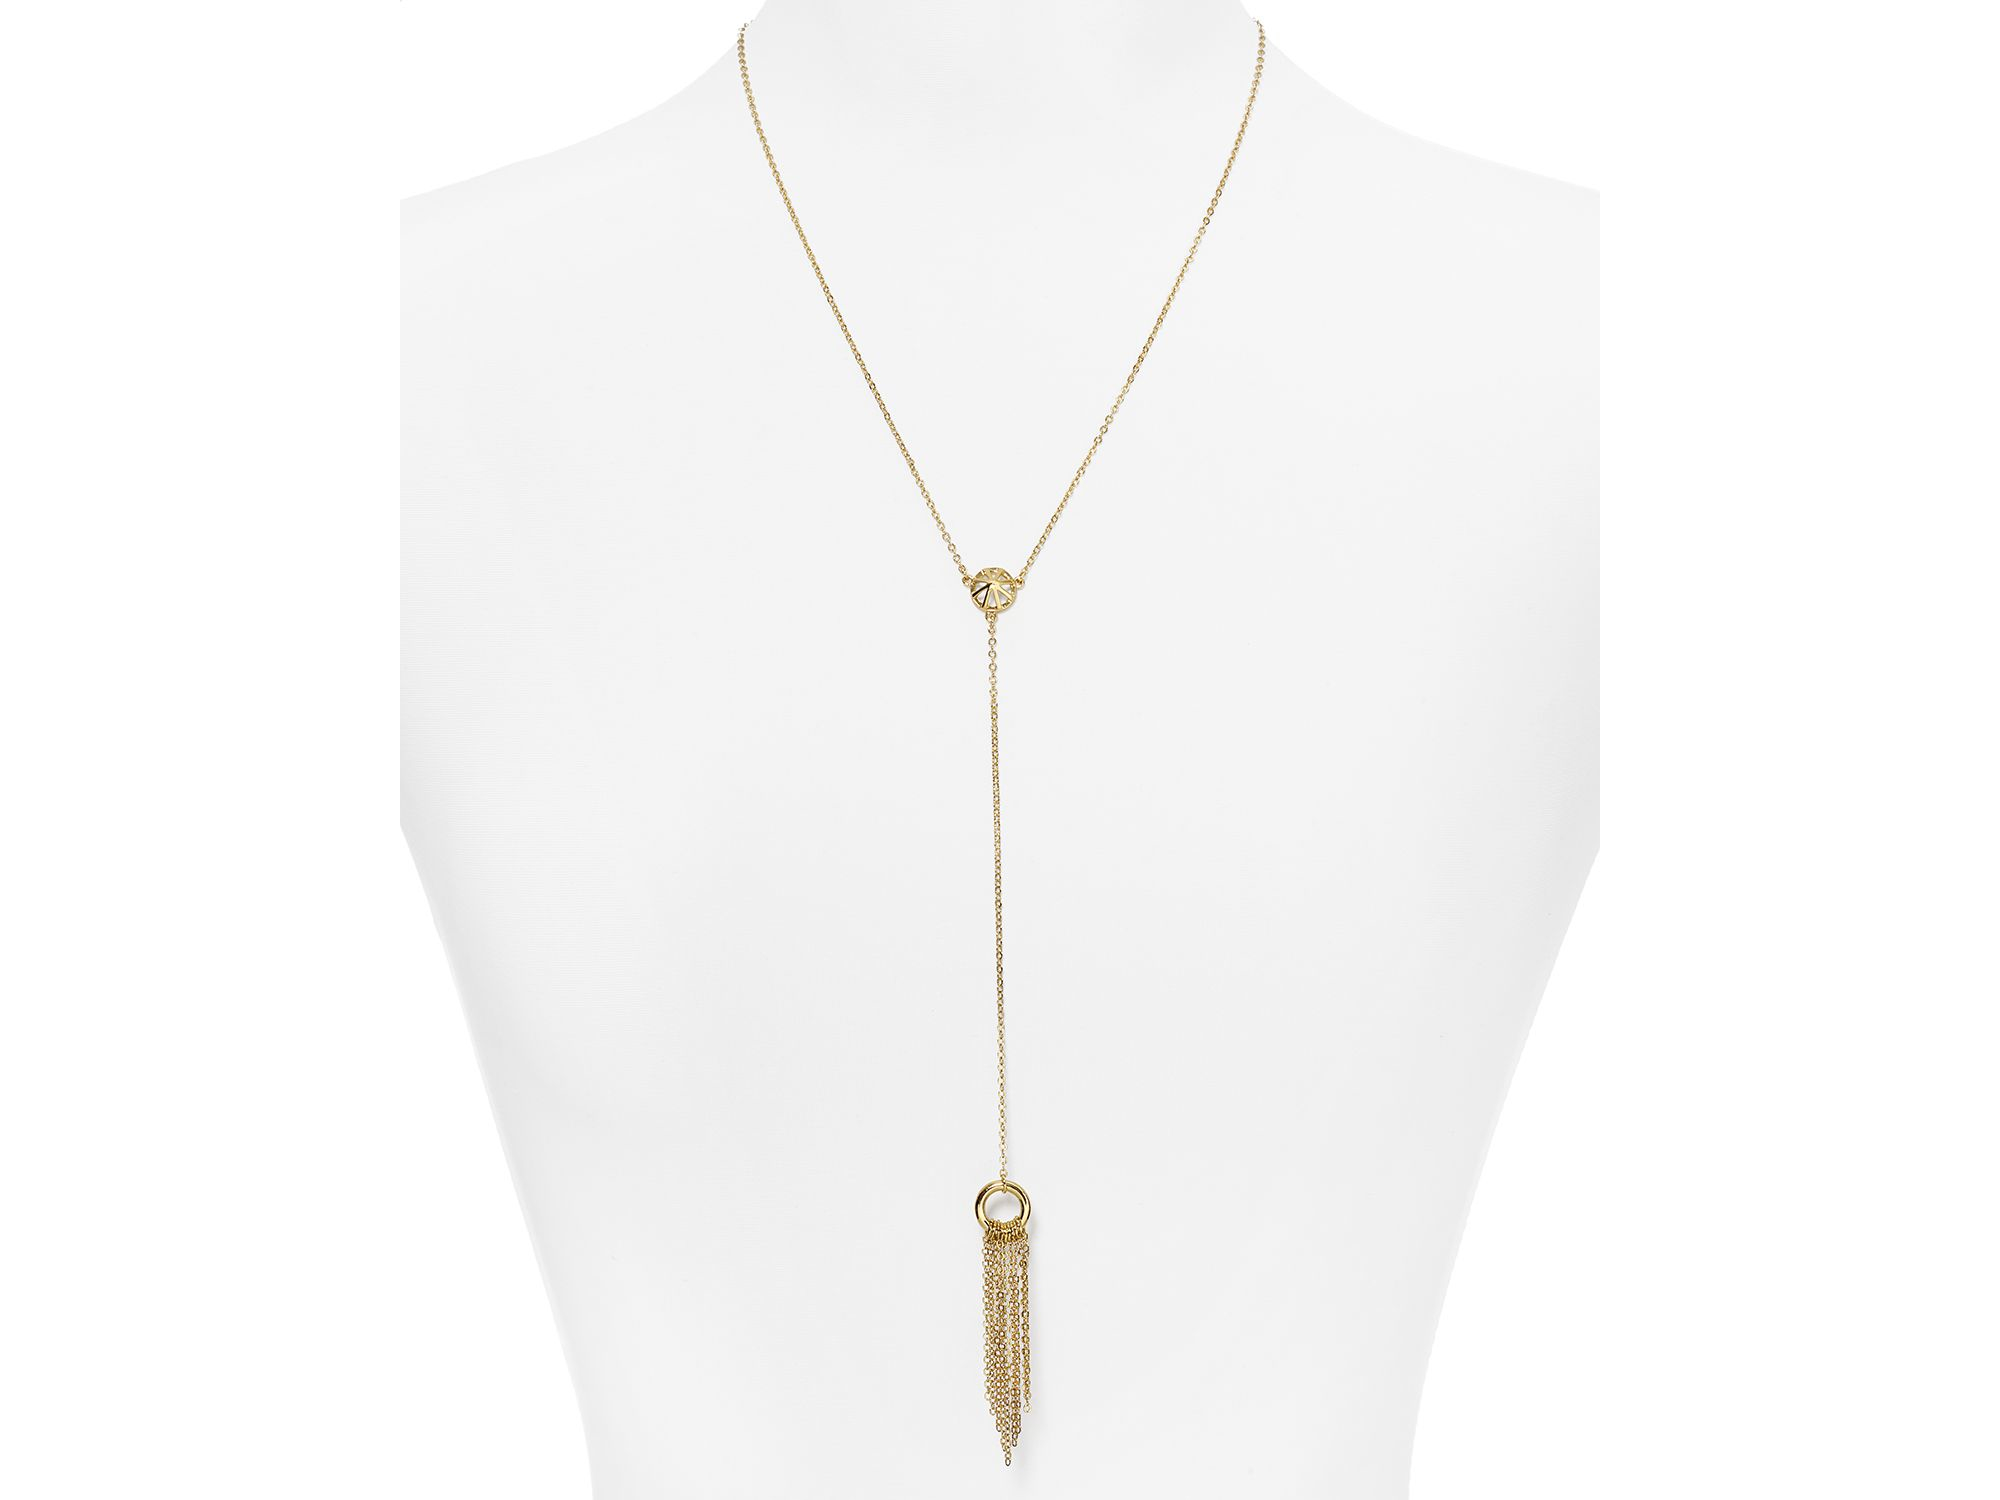 Rebecca Minkoff Heart Lariat Necklace in Metallic Gold QQtaM